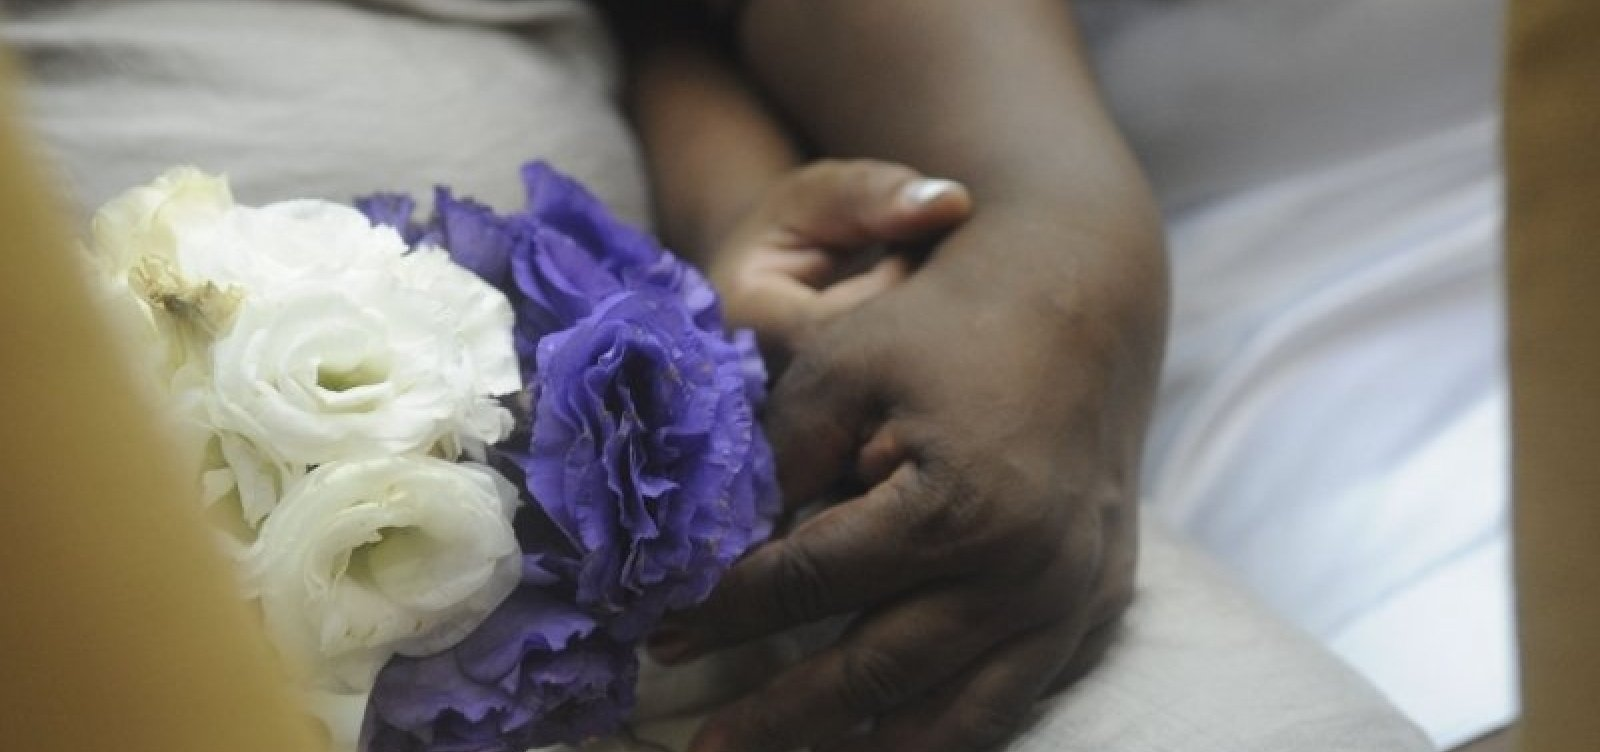 IBGE: Número de casamentos e divórcios atinge recorde no estado